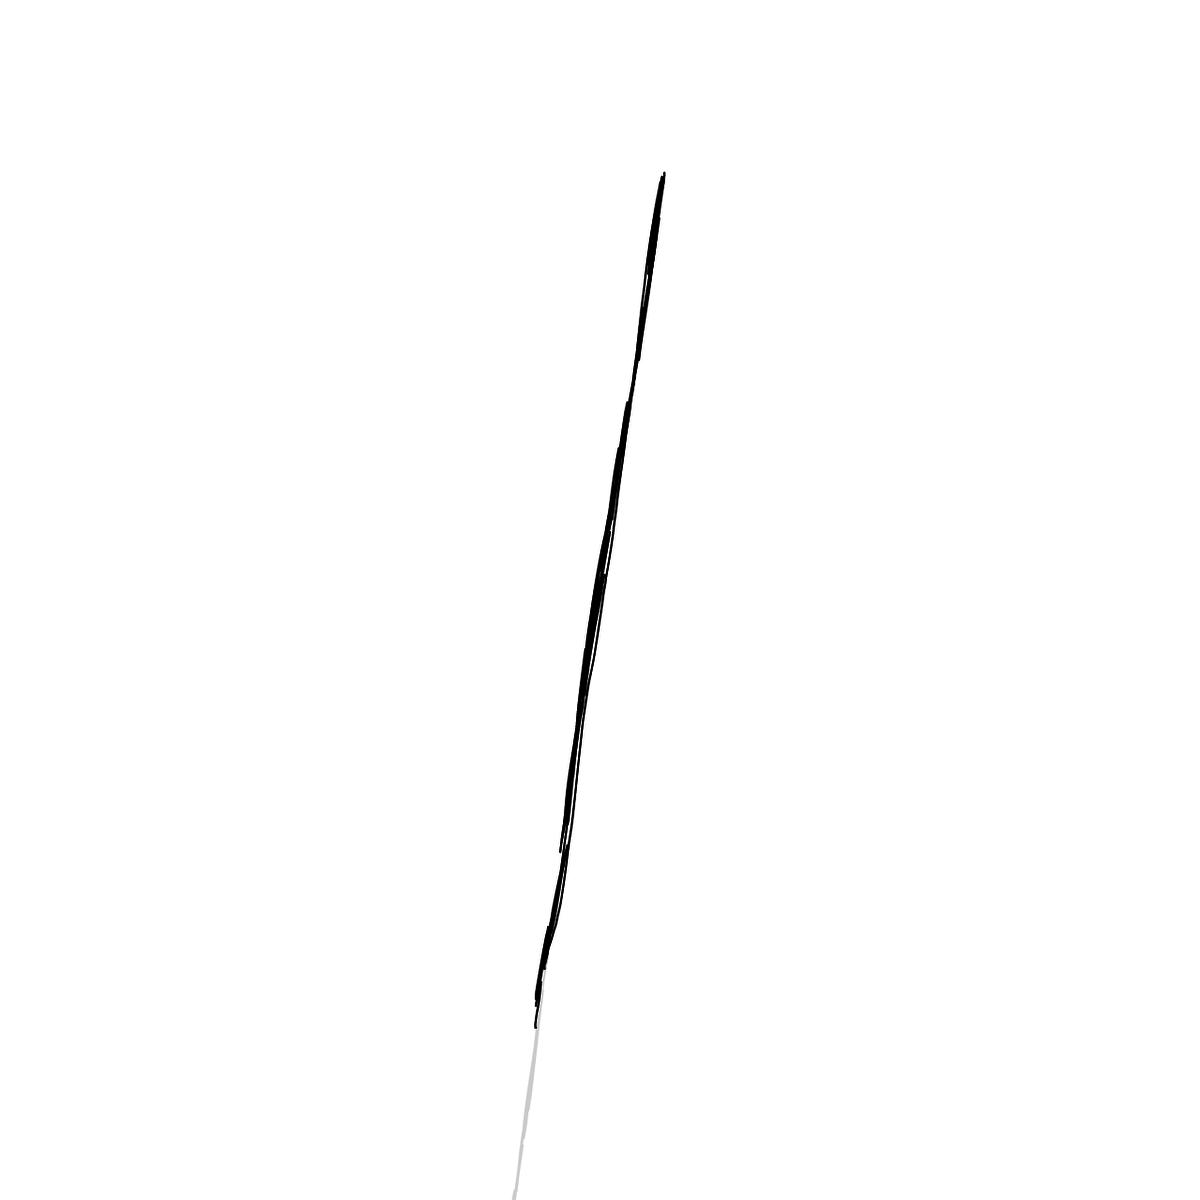 BAAAM drawing#16726 lat:40.7132911682128900lng: -74.0124740600586000